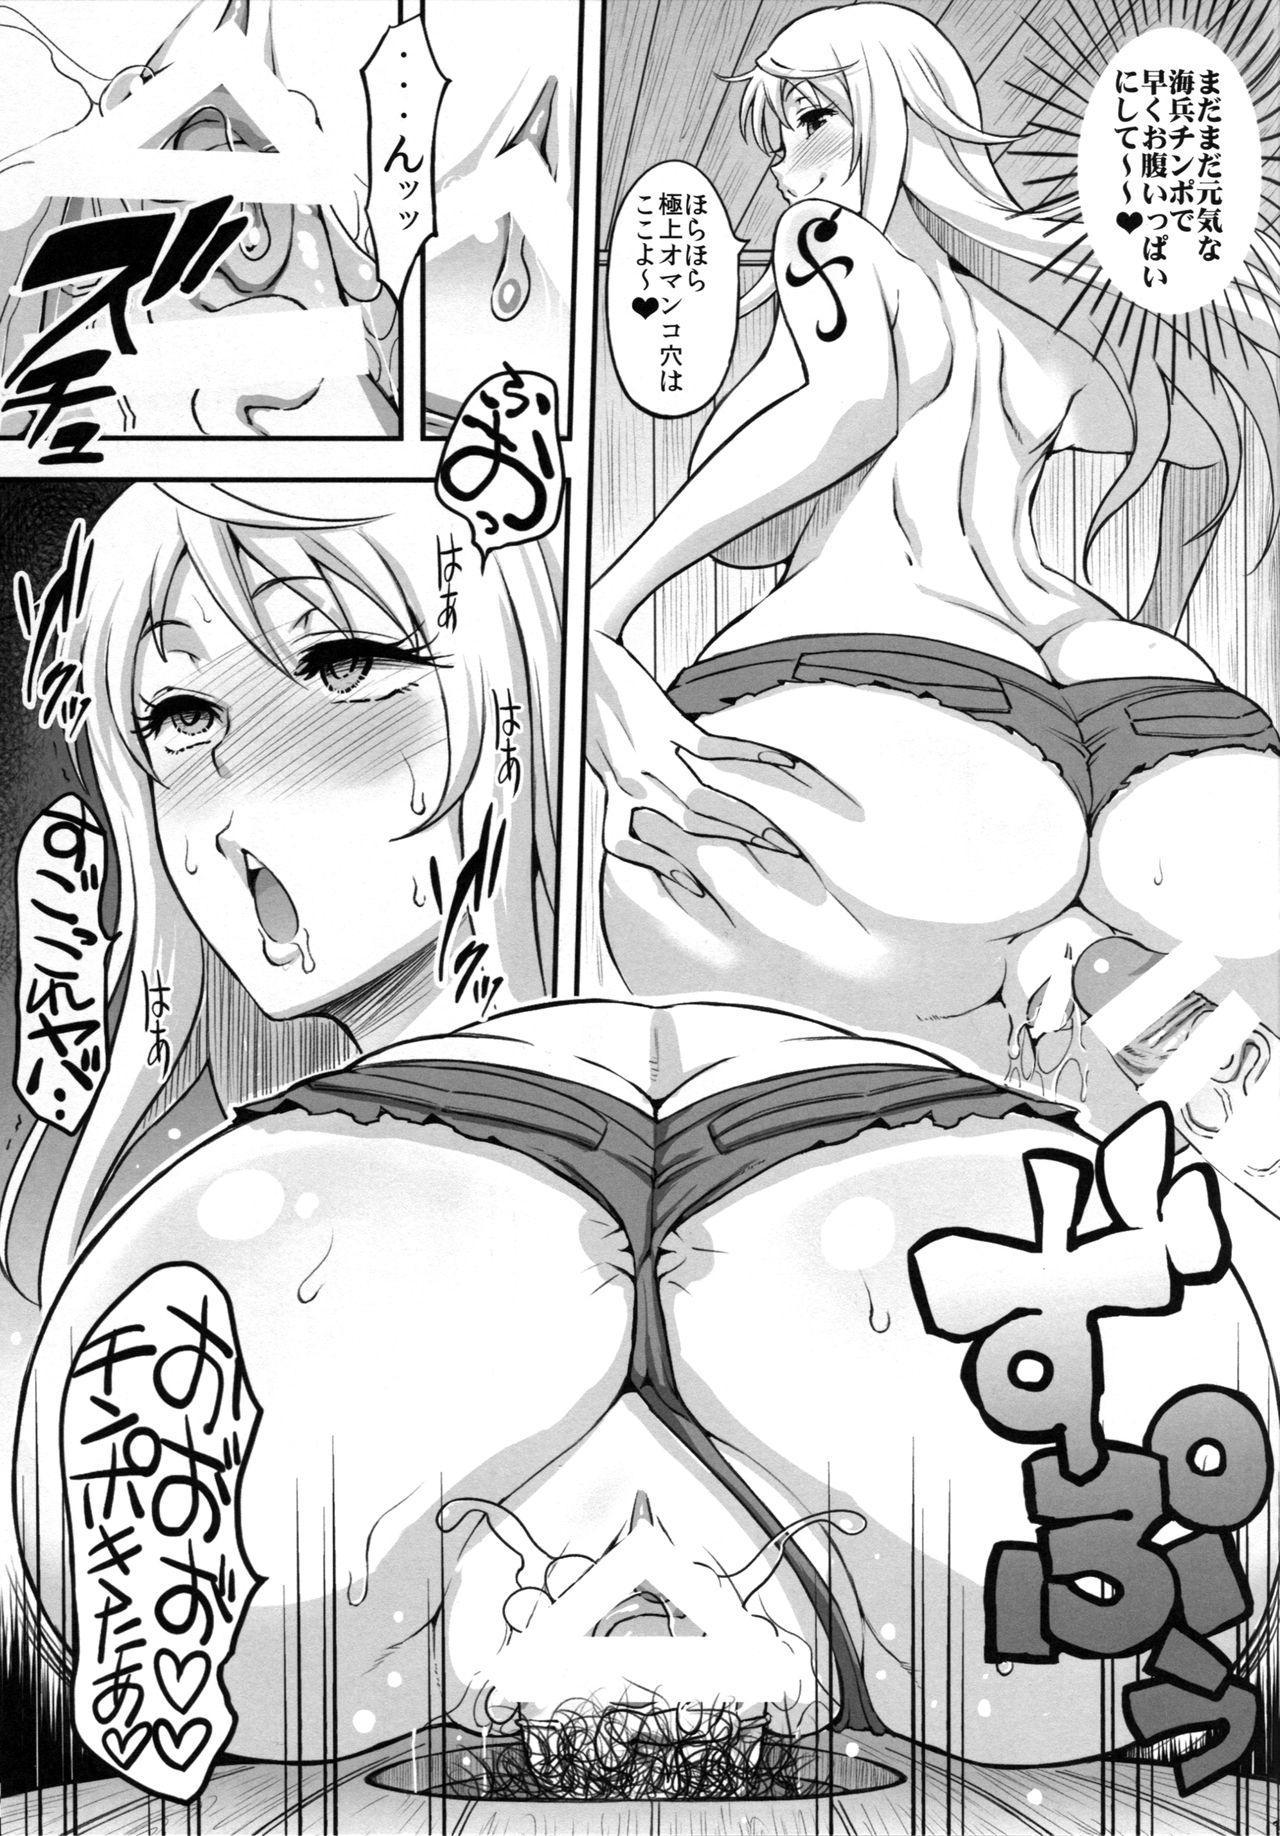 Rakuen Onna Kaizoku 5 - Women Pirate in Paradise 13